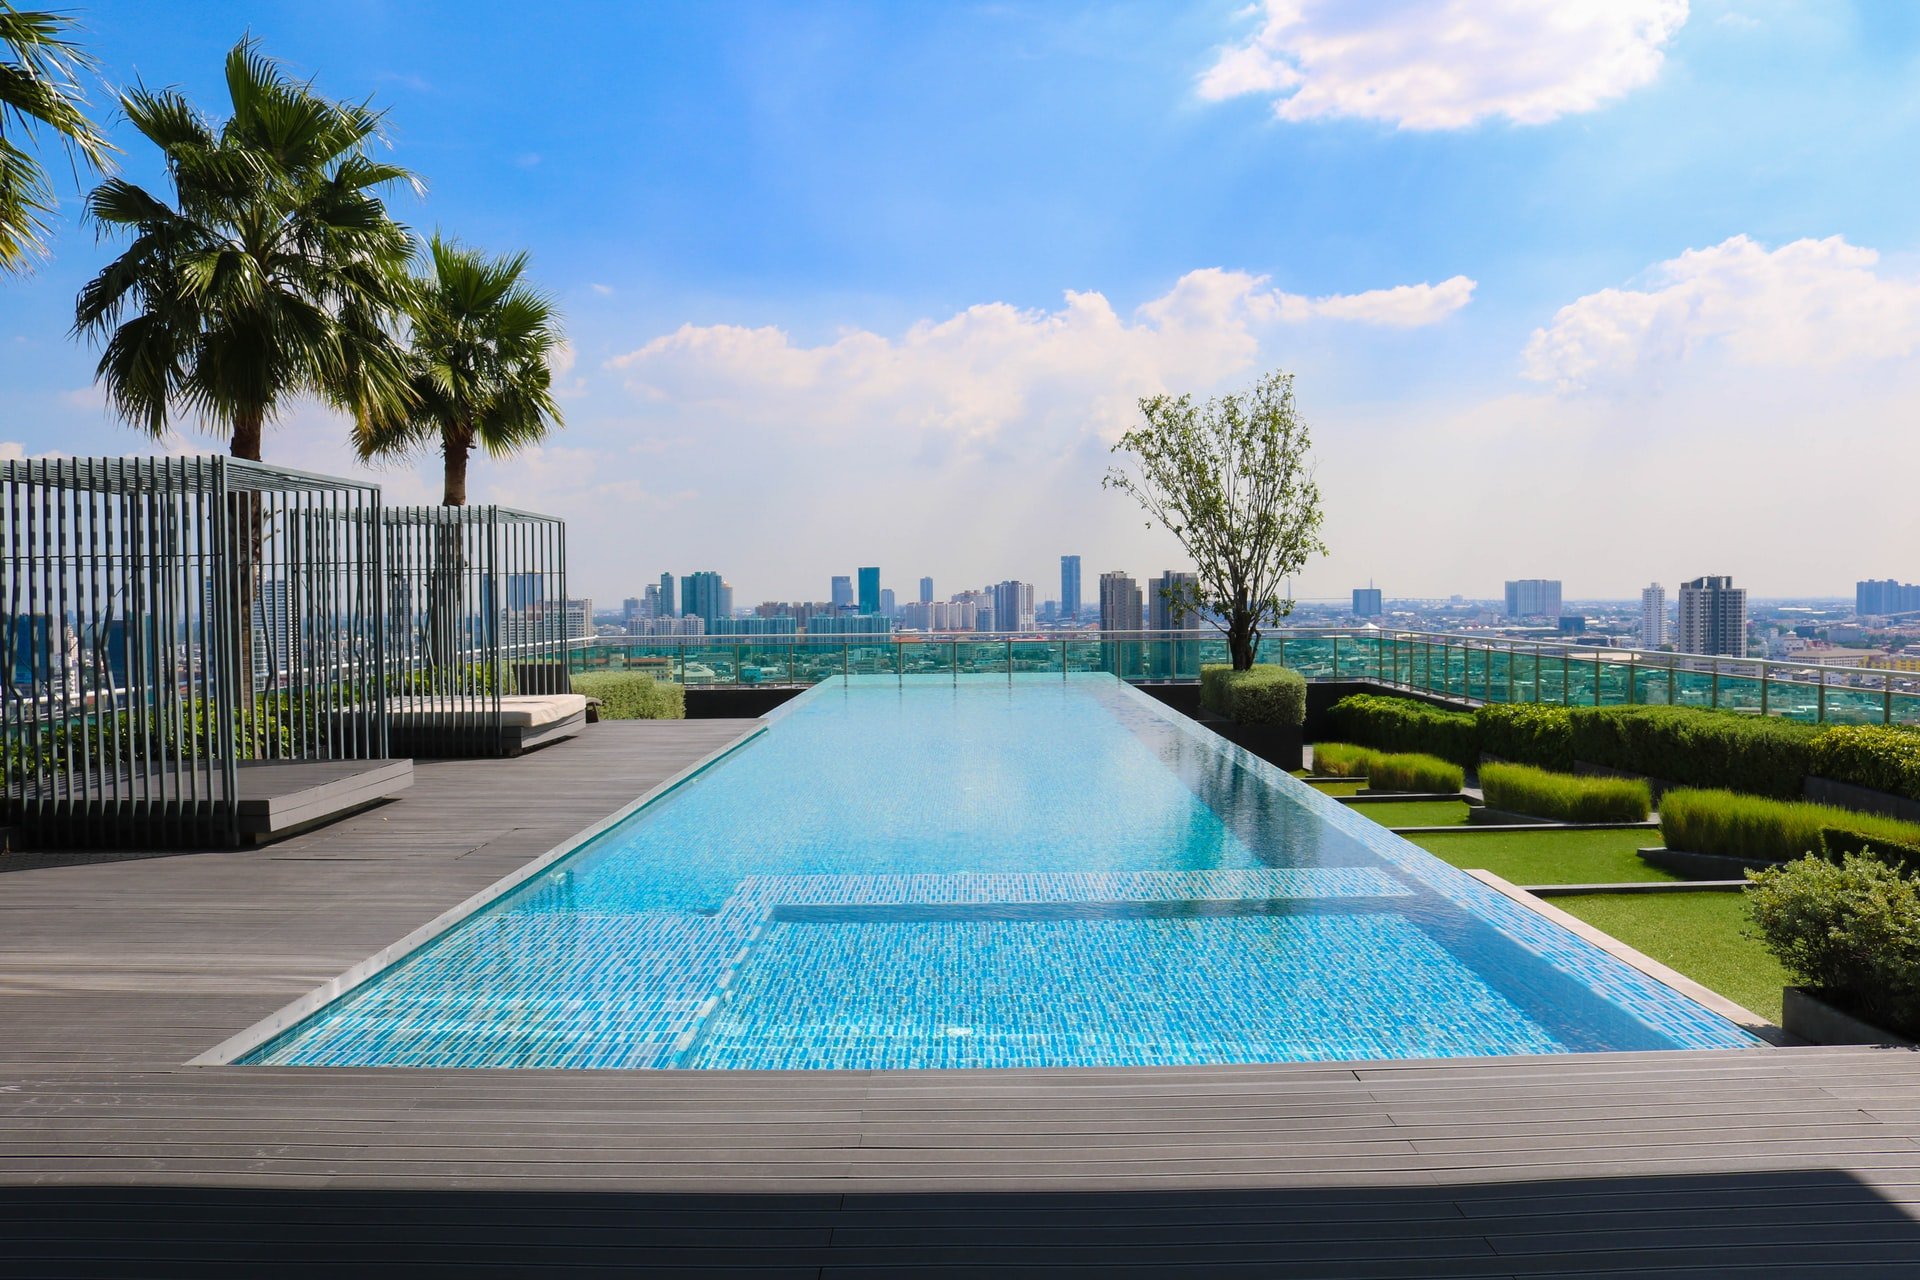 Digital Marketing for Pool Companies